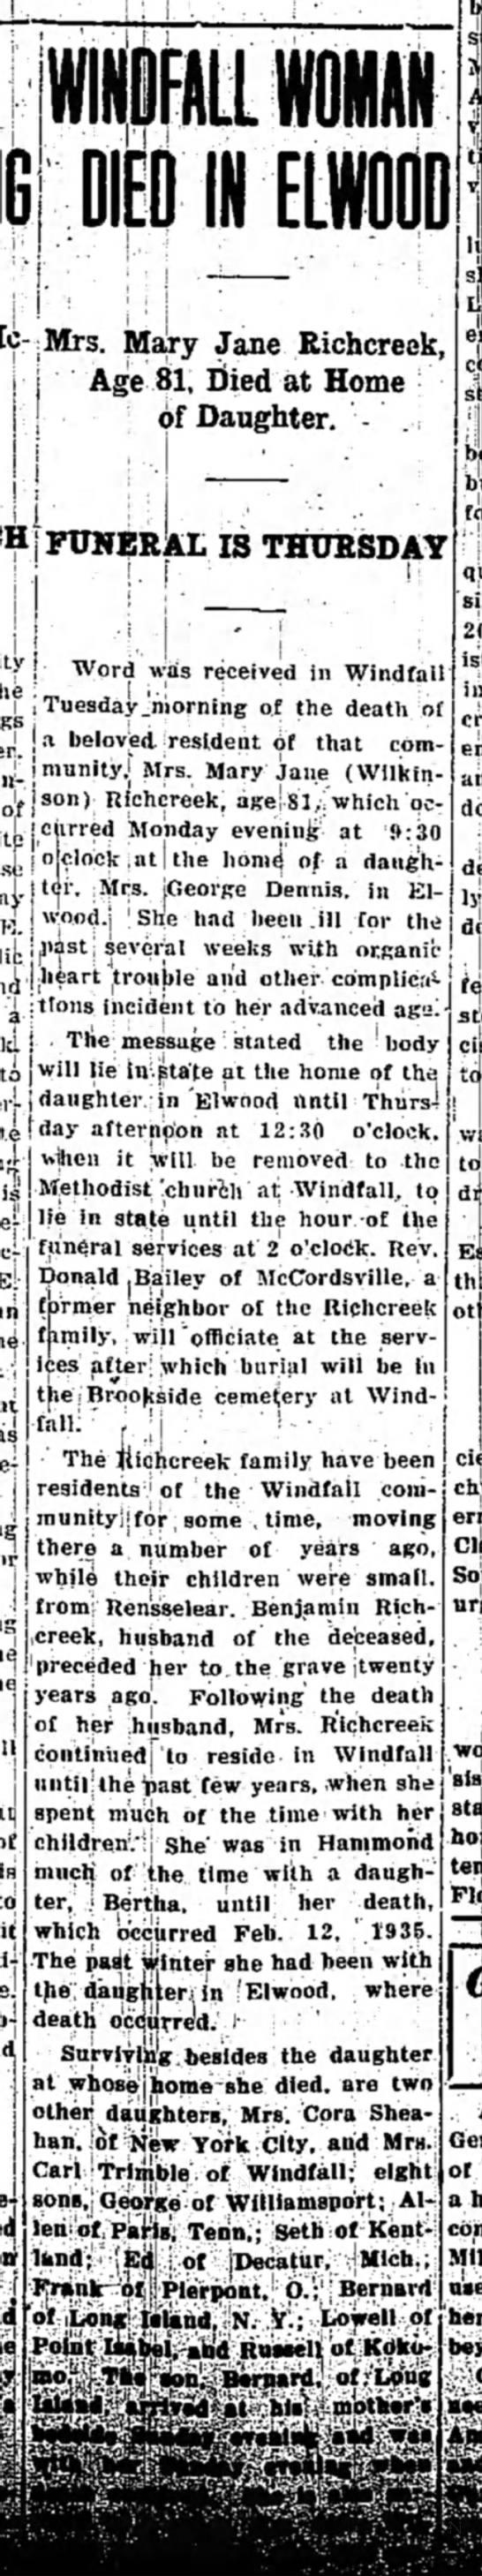 Mary Jane Richcreek Death Notice- 14-Apr-1936